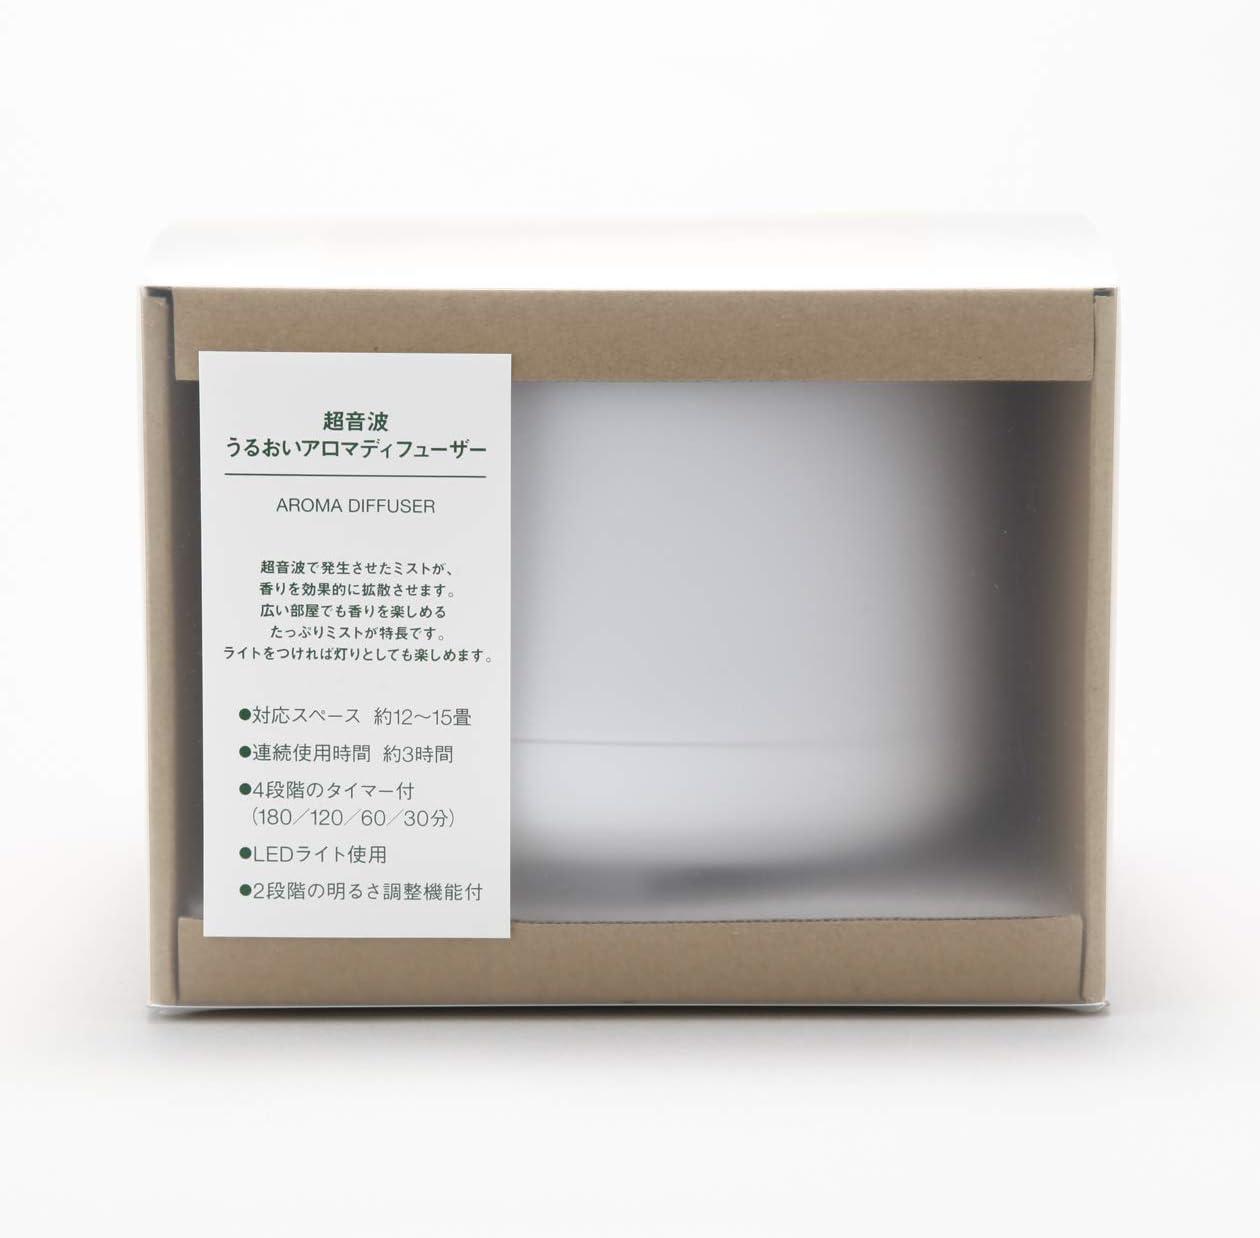 16,8 cm De Di/ámetro x 12,1 cm Altura Muji Difusor De Aroma